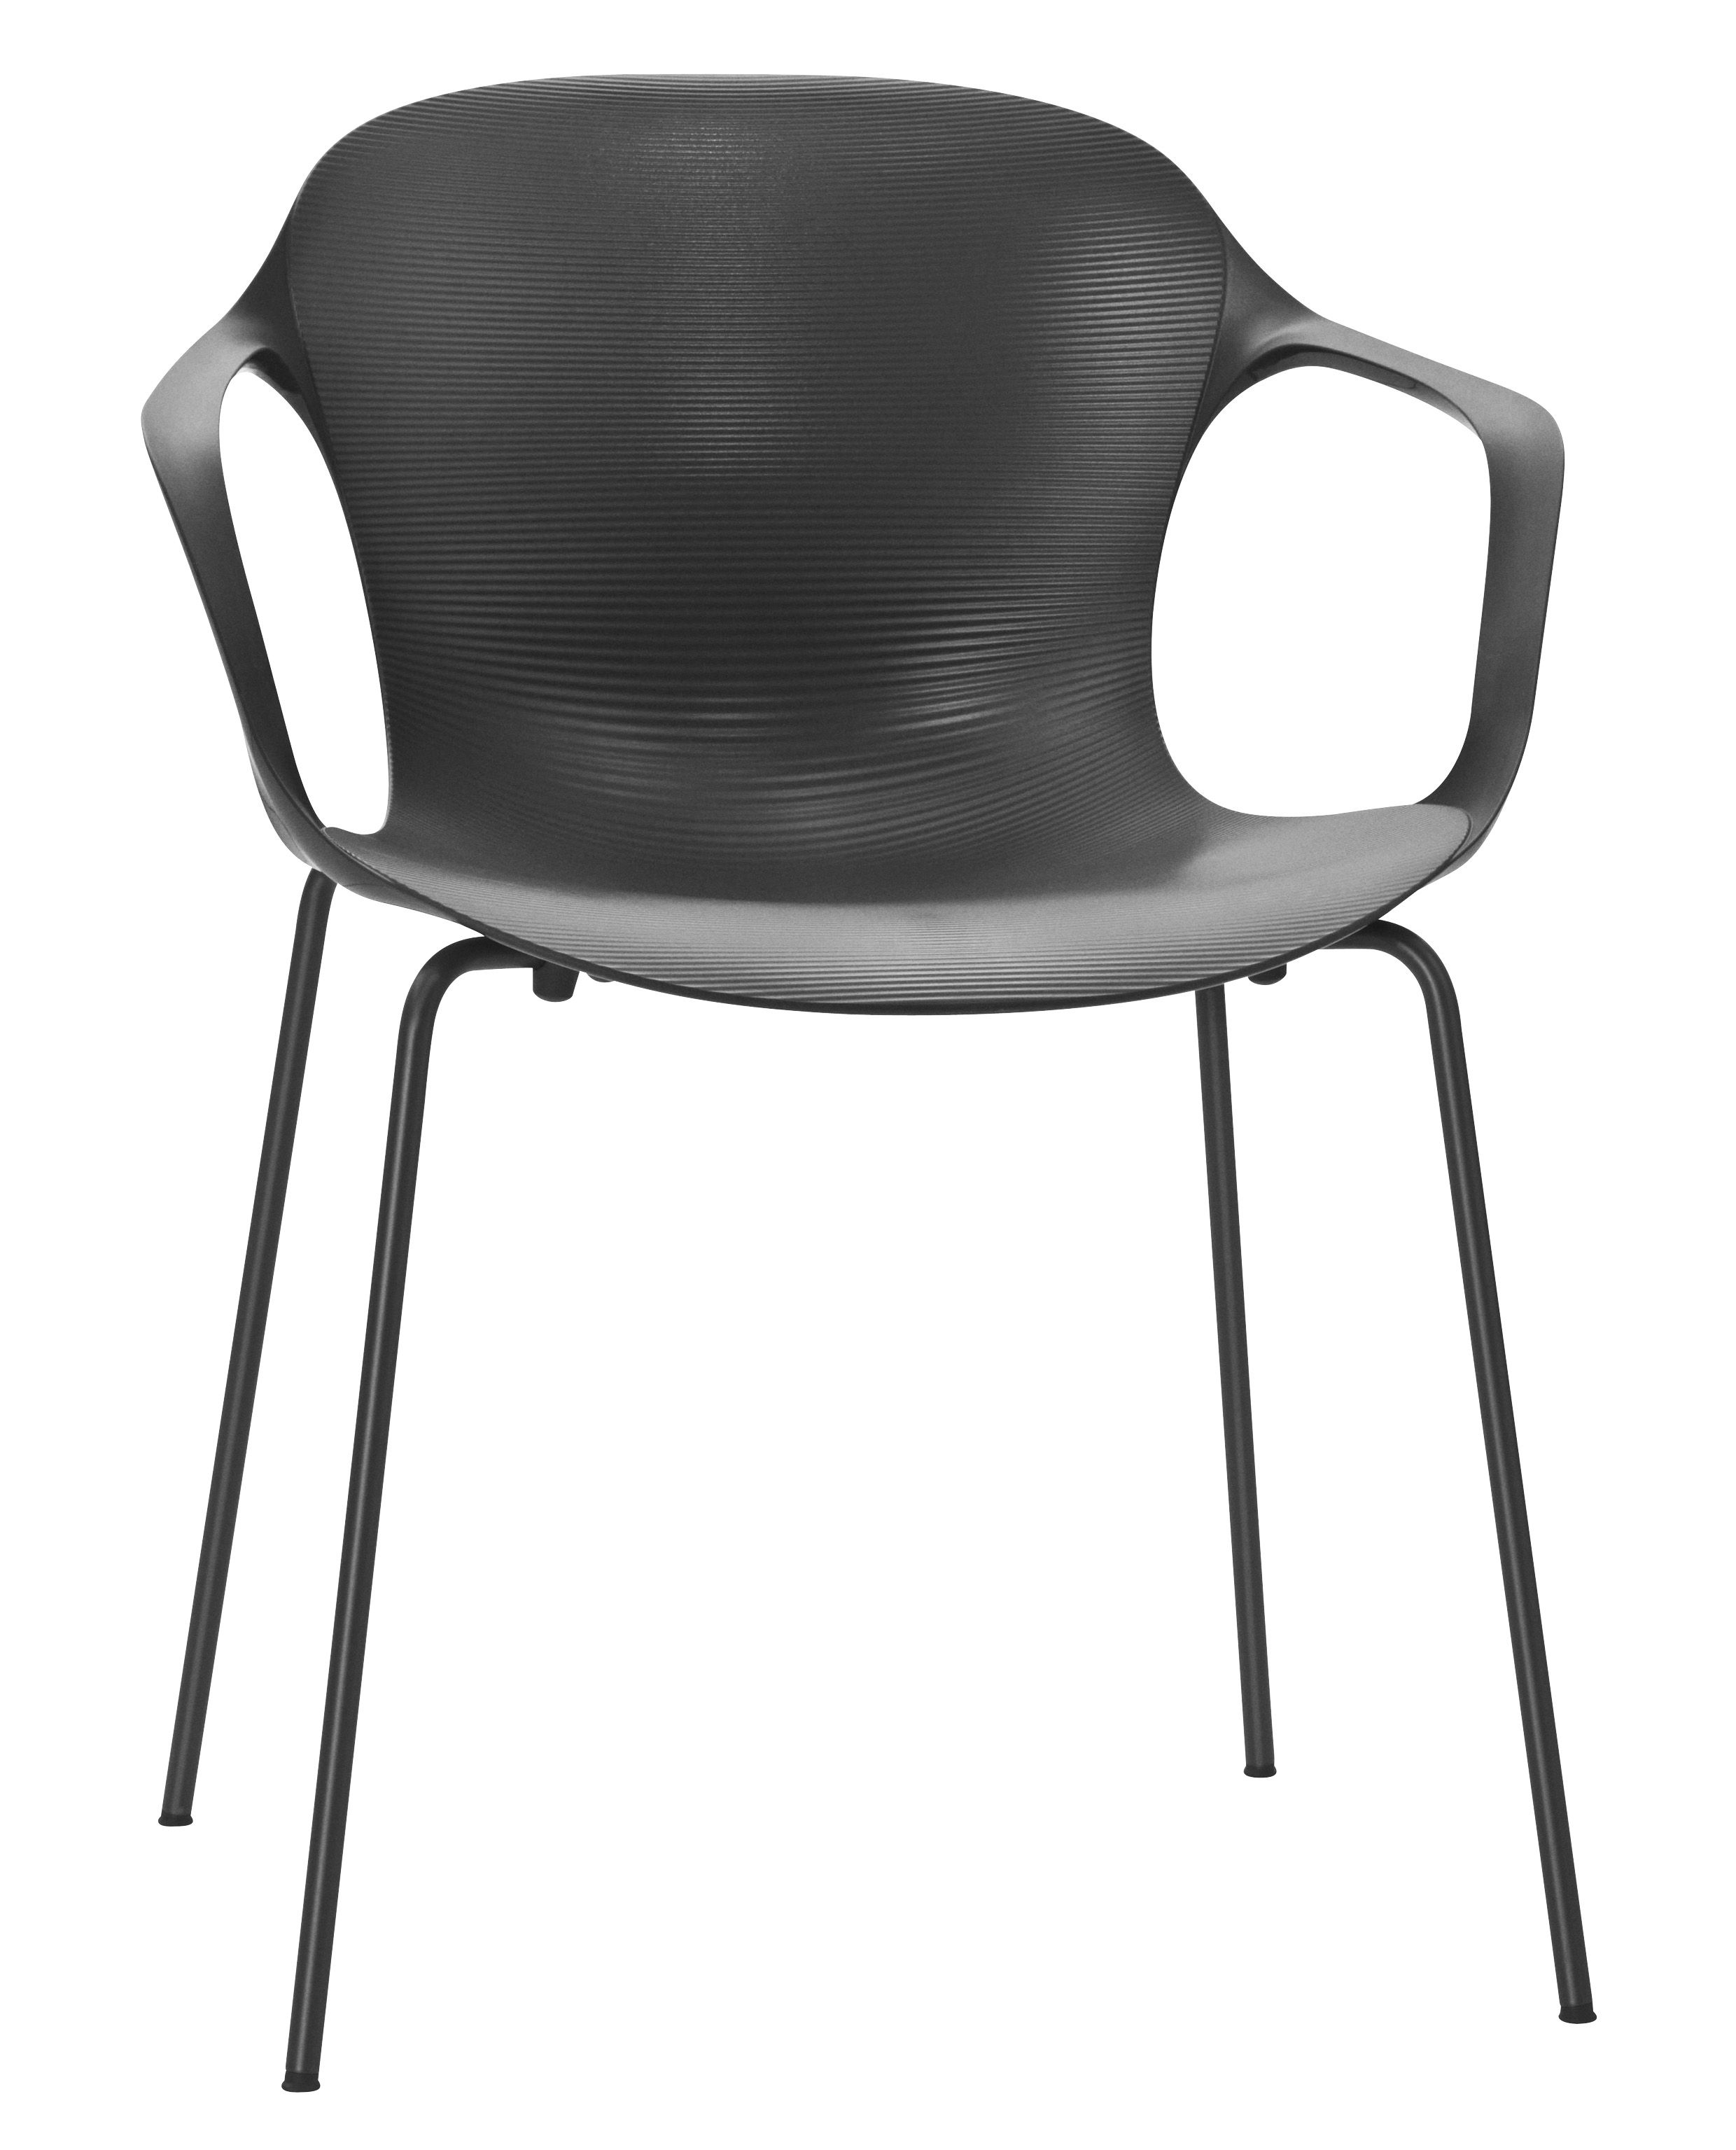 Möbel - Stühle  - Nap Stapelbarer Sessel - Fritz Hansen - Grau - lackierter Stahl, Polyamid